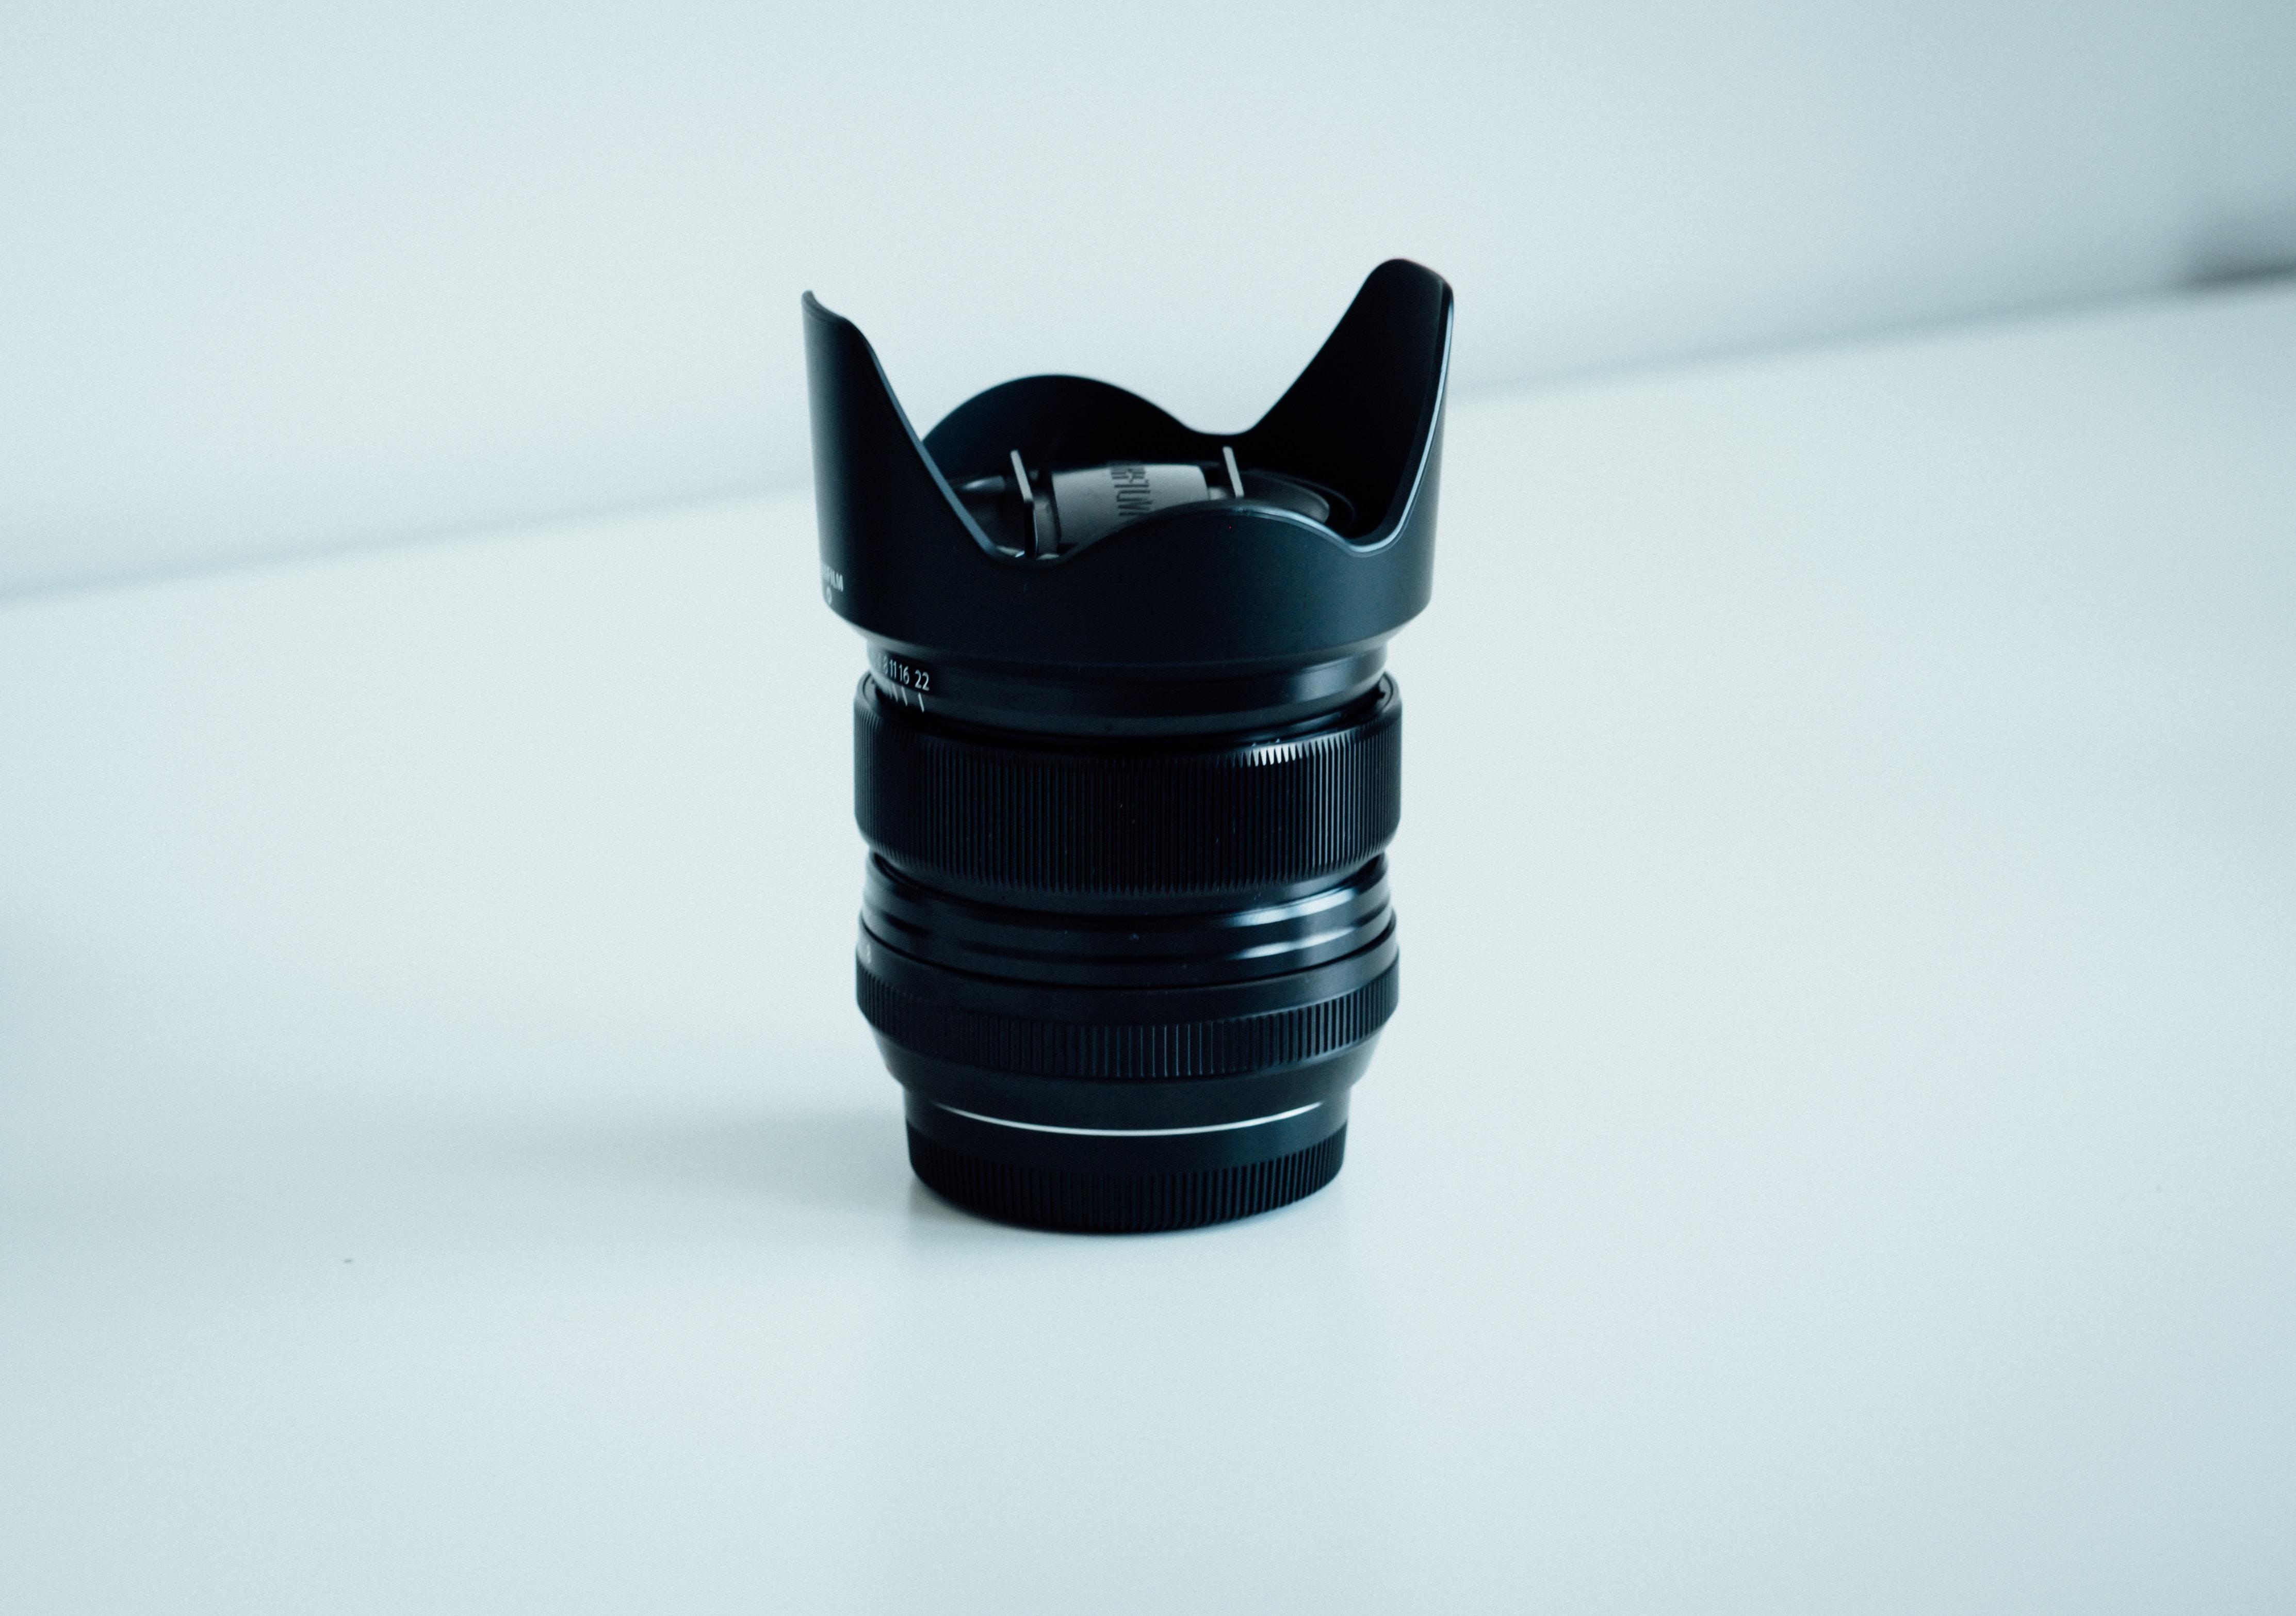 close-up photography of DSLR camera lens